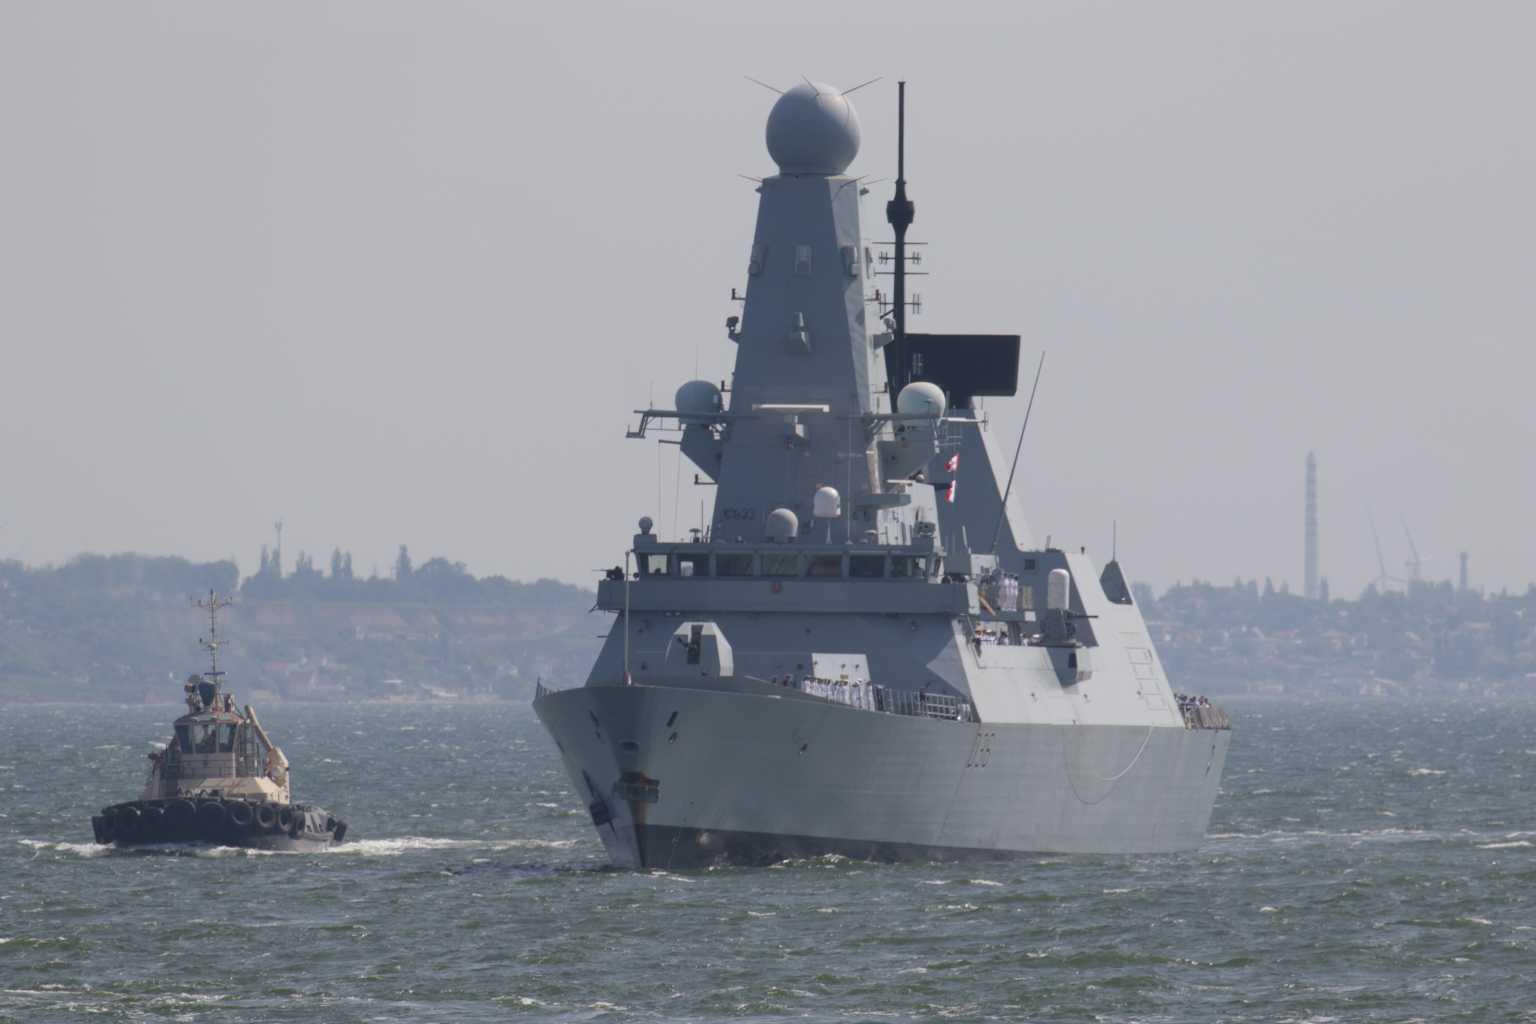 HMS Defender: Οι Ρώσοι το «λήγουν» με απειλές – Την επόμενη φορά δεν θα φταίμε